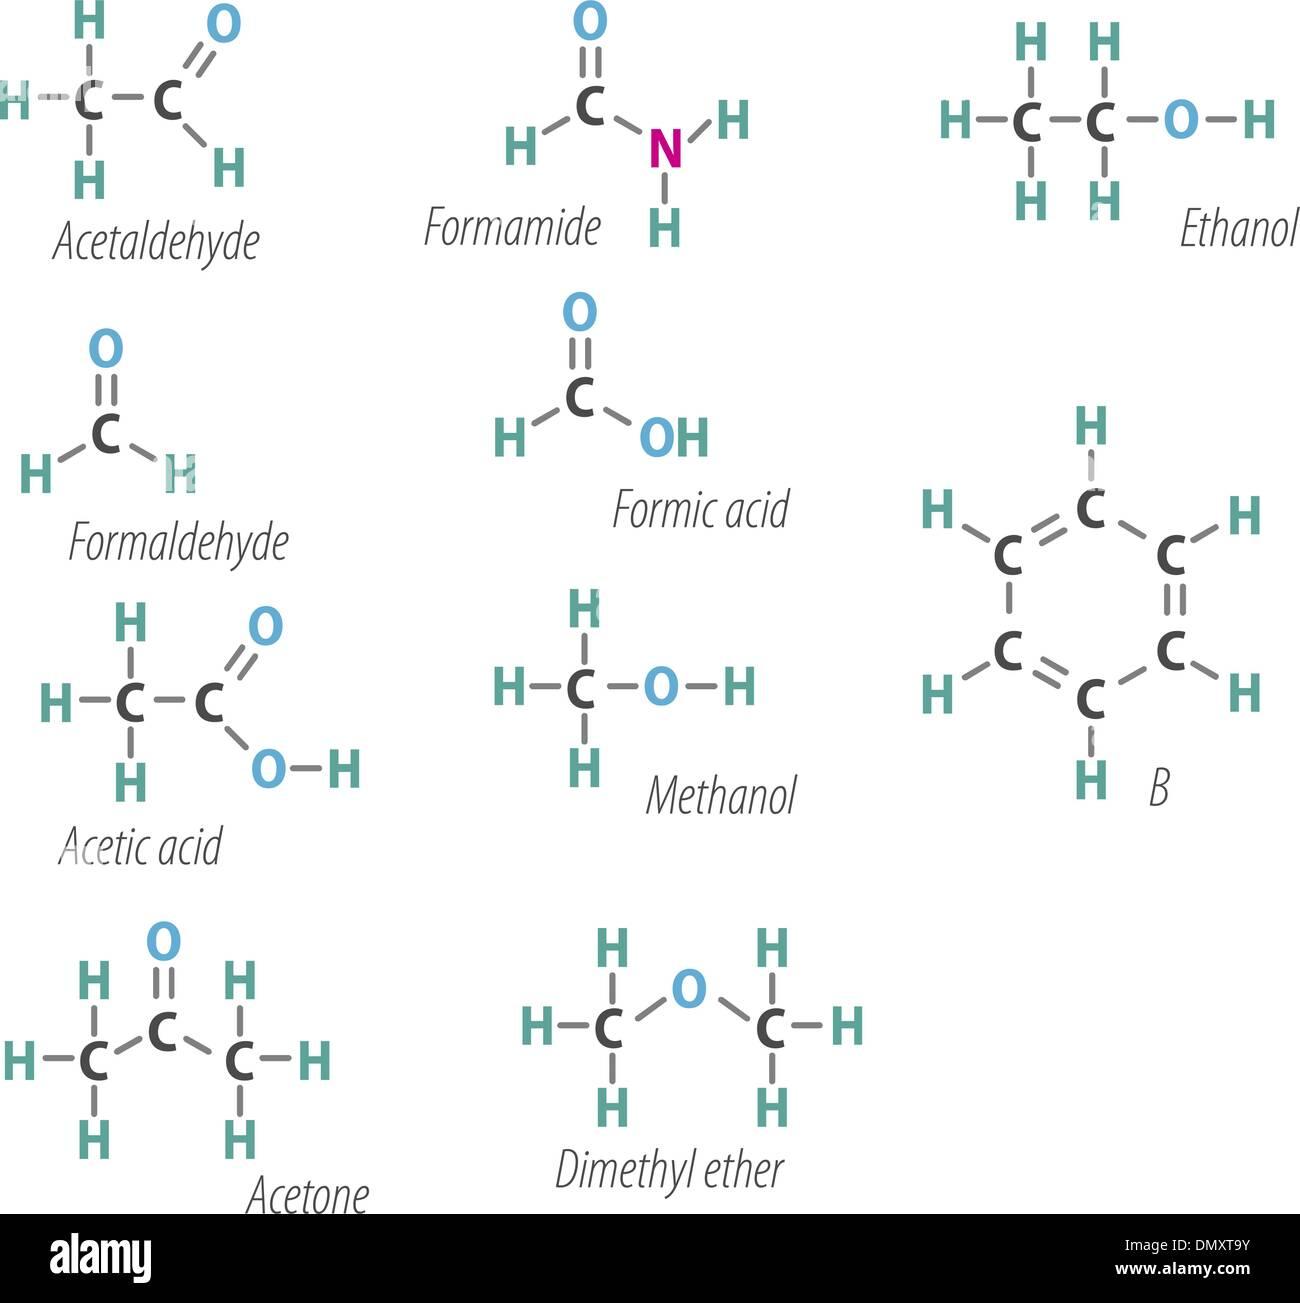 Chemistri formulas - Stock Image